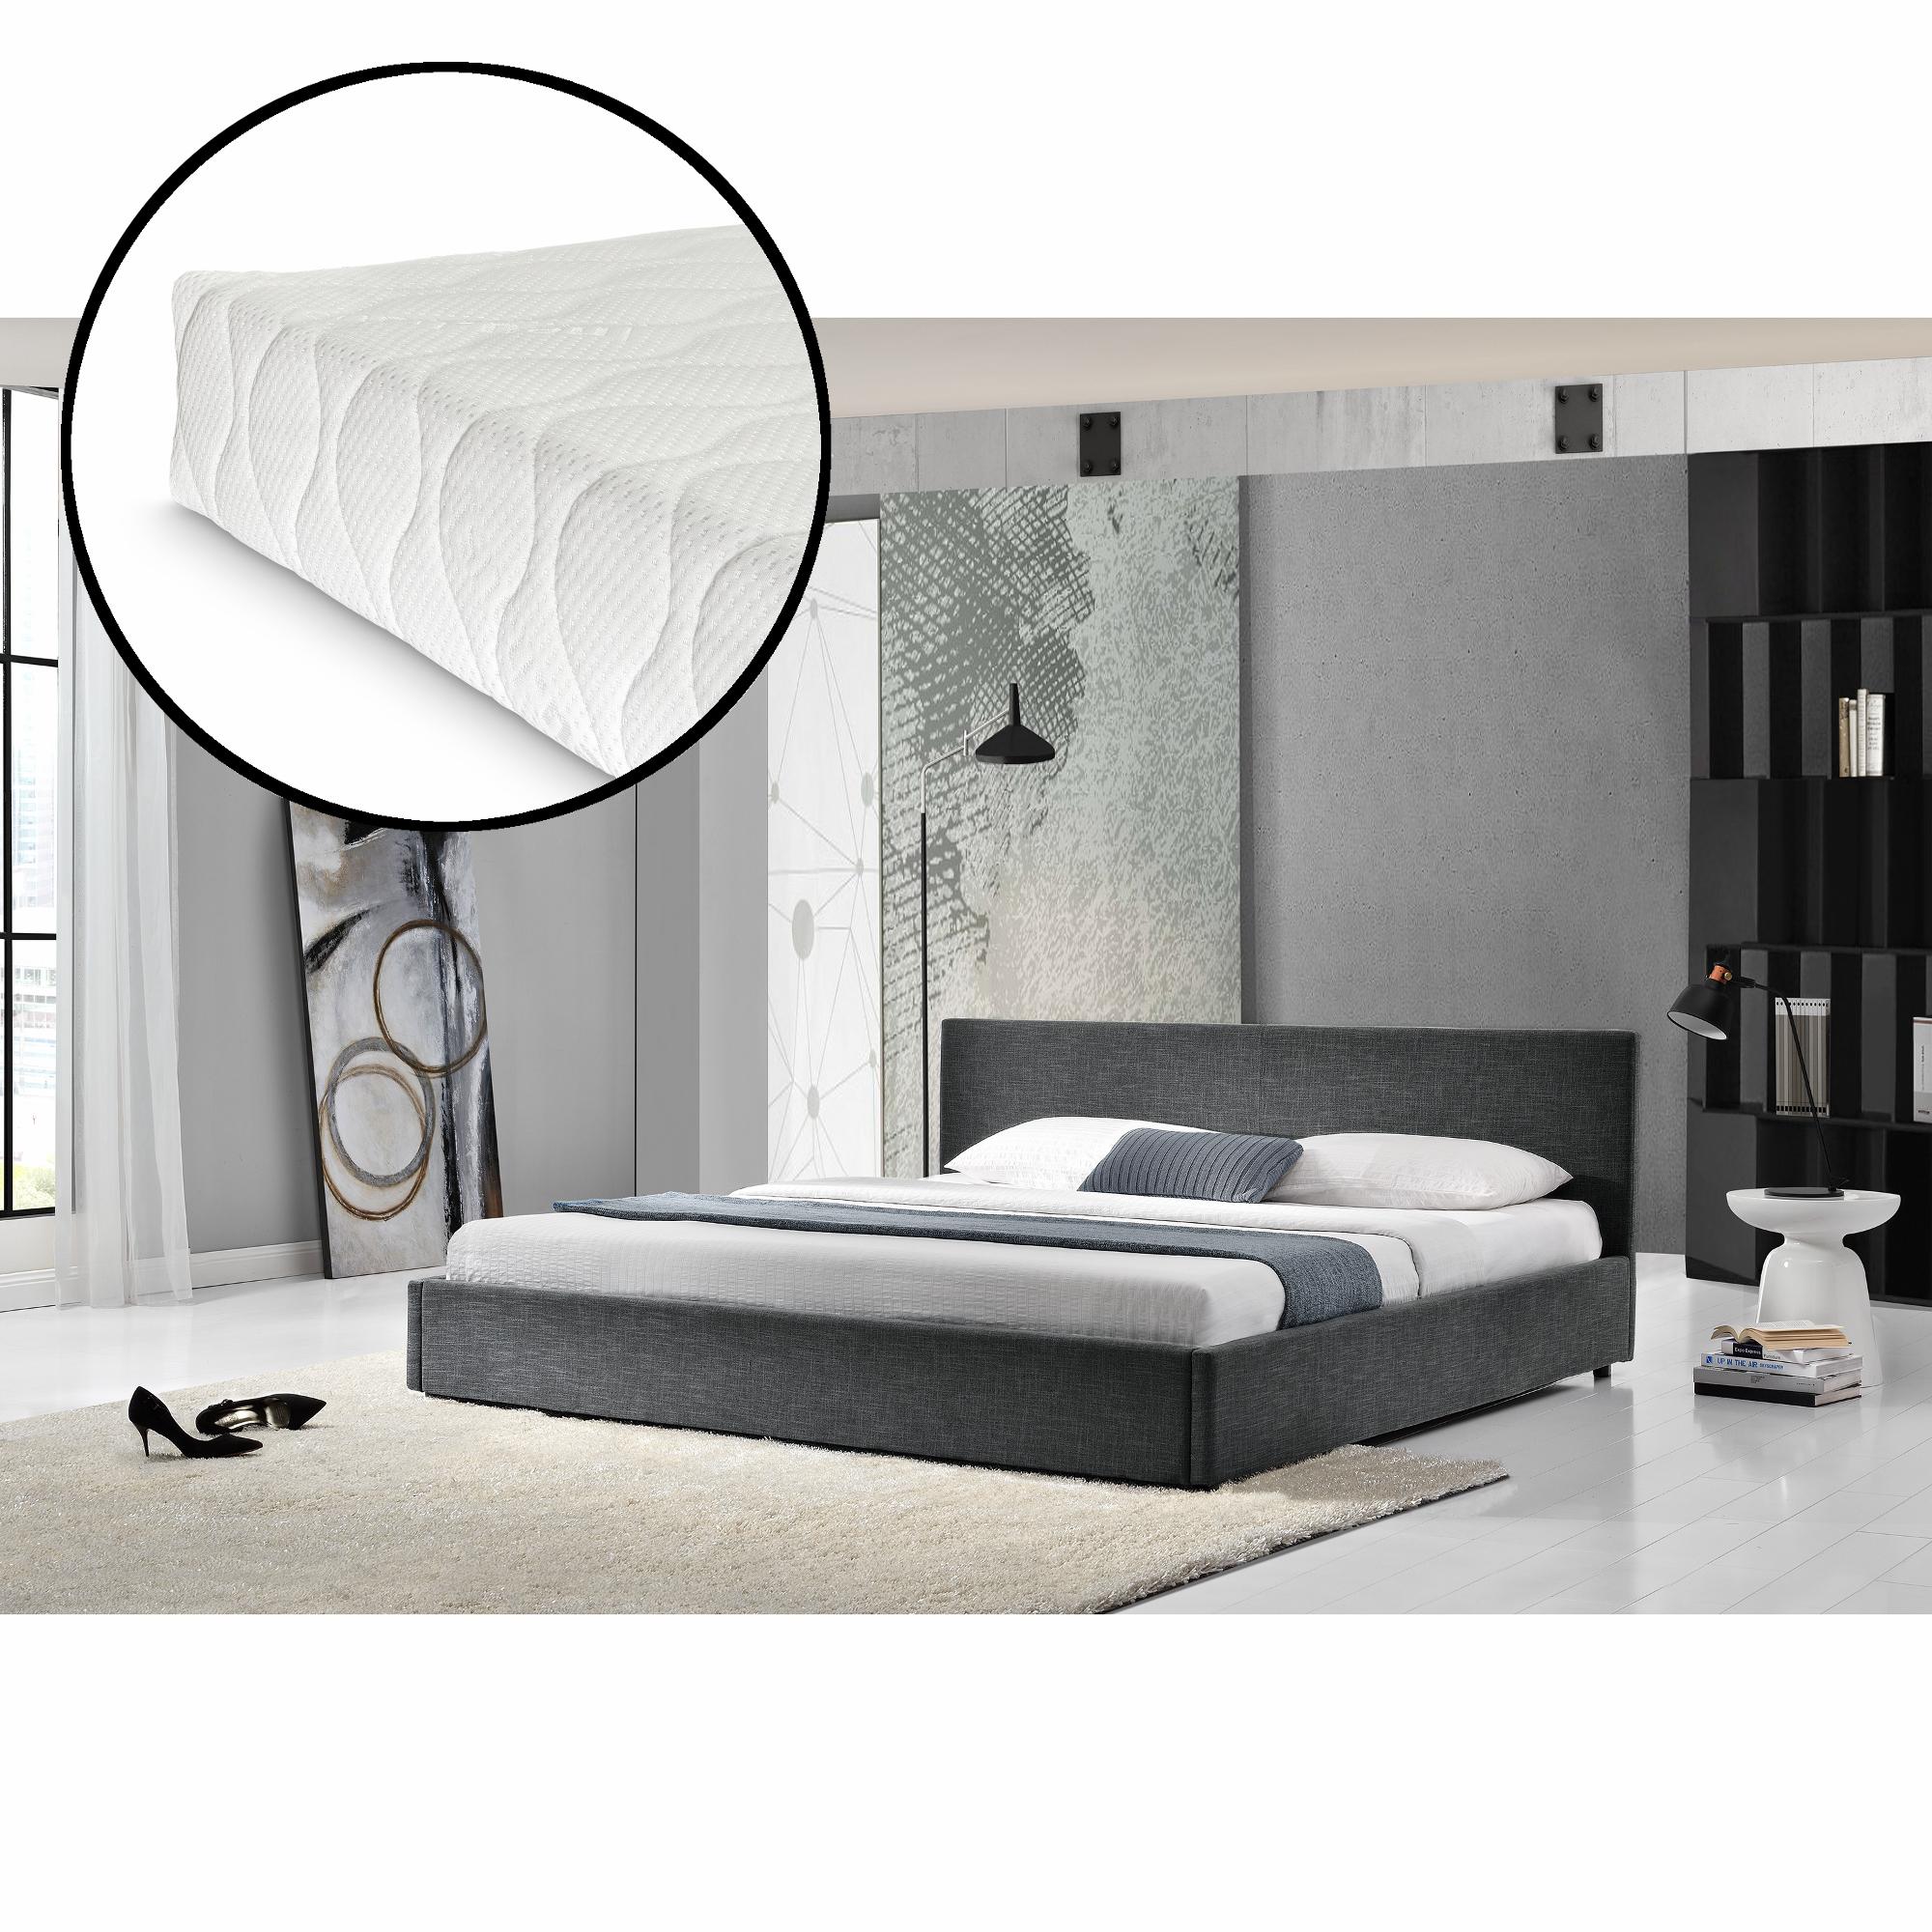 my bed lit capitonn matelas 140x200cm noir tissu lit double sommier ebay. Black Bedroom Furniture Sets. Home Design Ideas